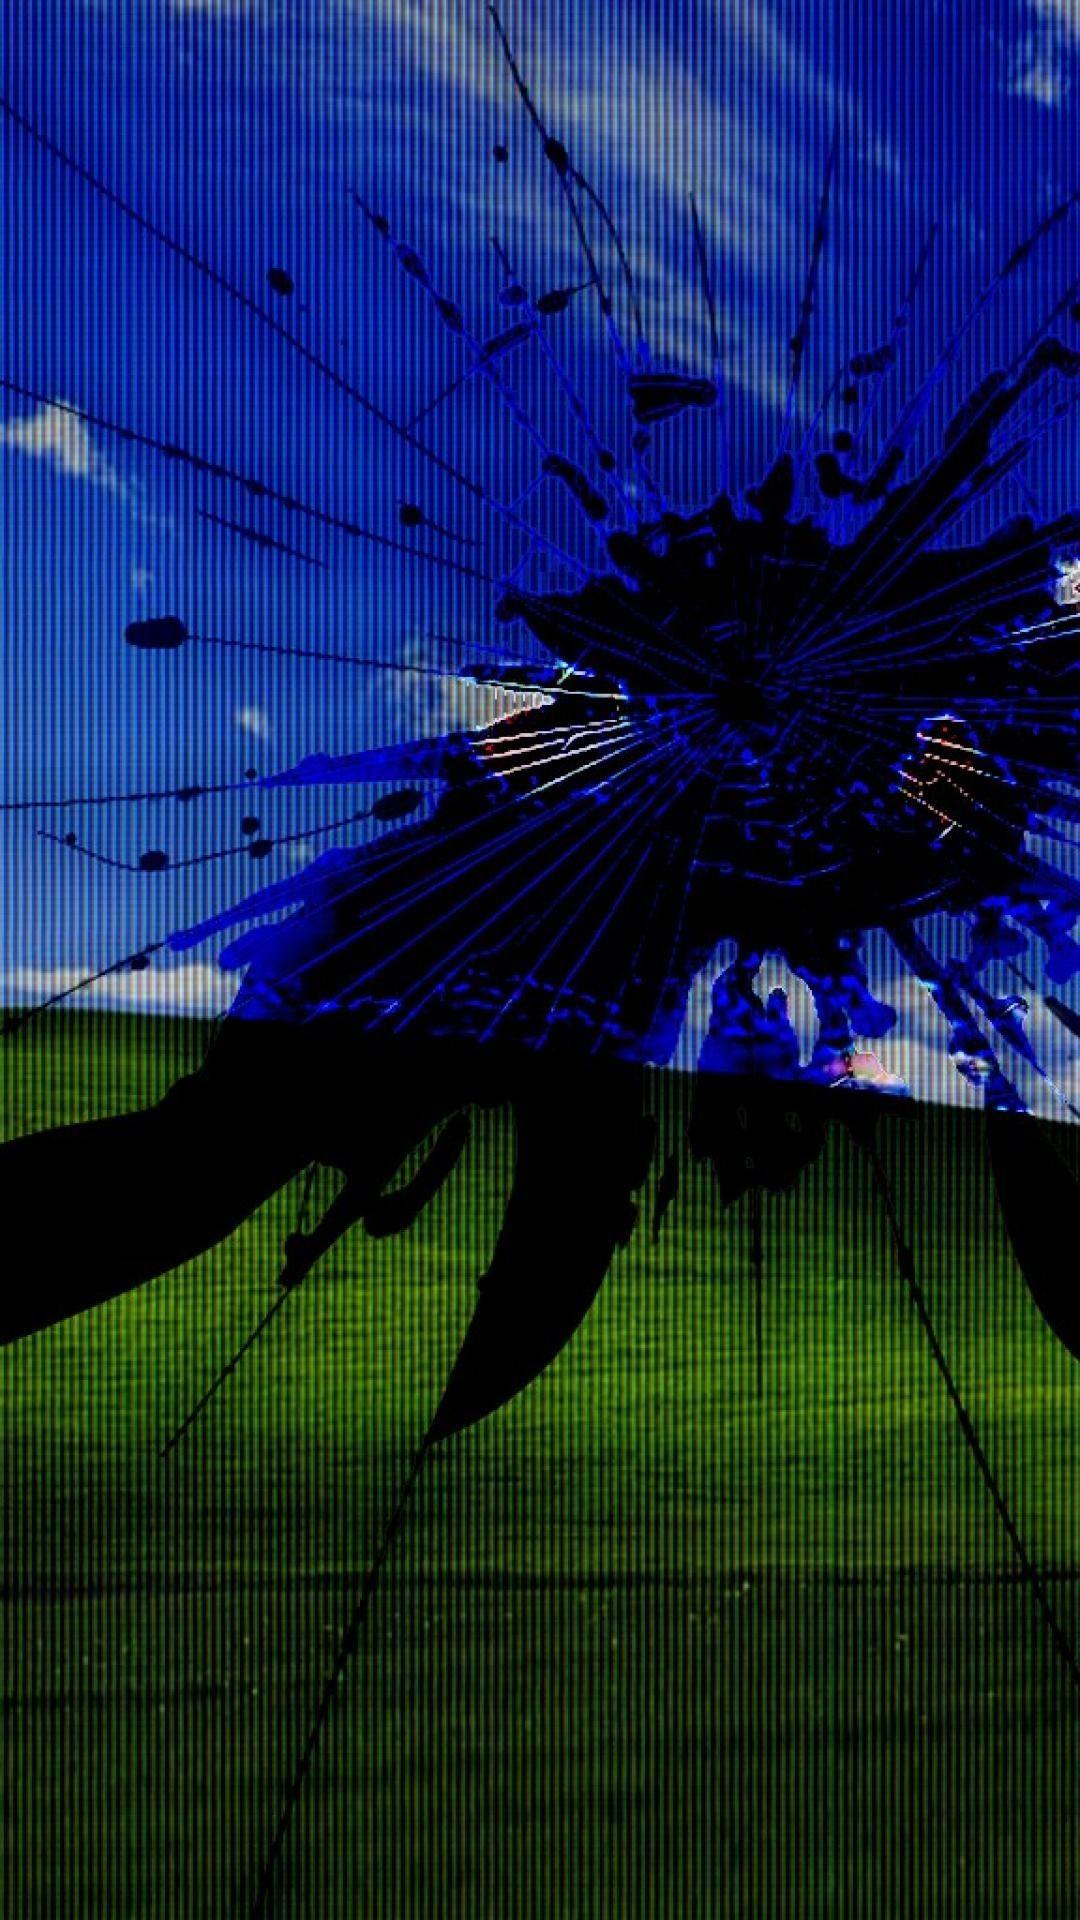 Broken Screen Wallpaper: Broken Lcd Screen Wallpaper (62+ Images